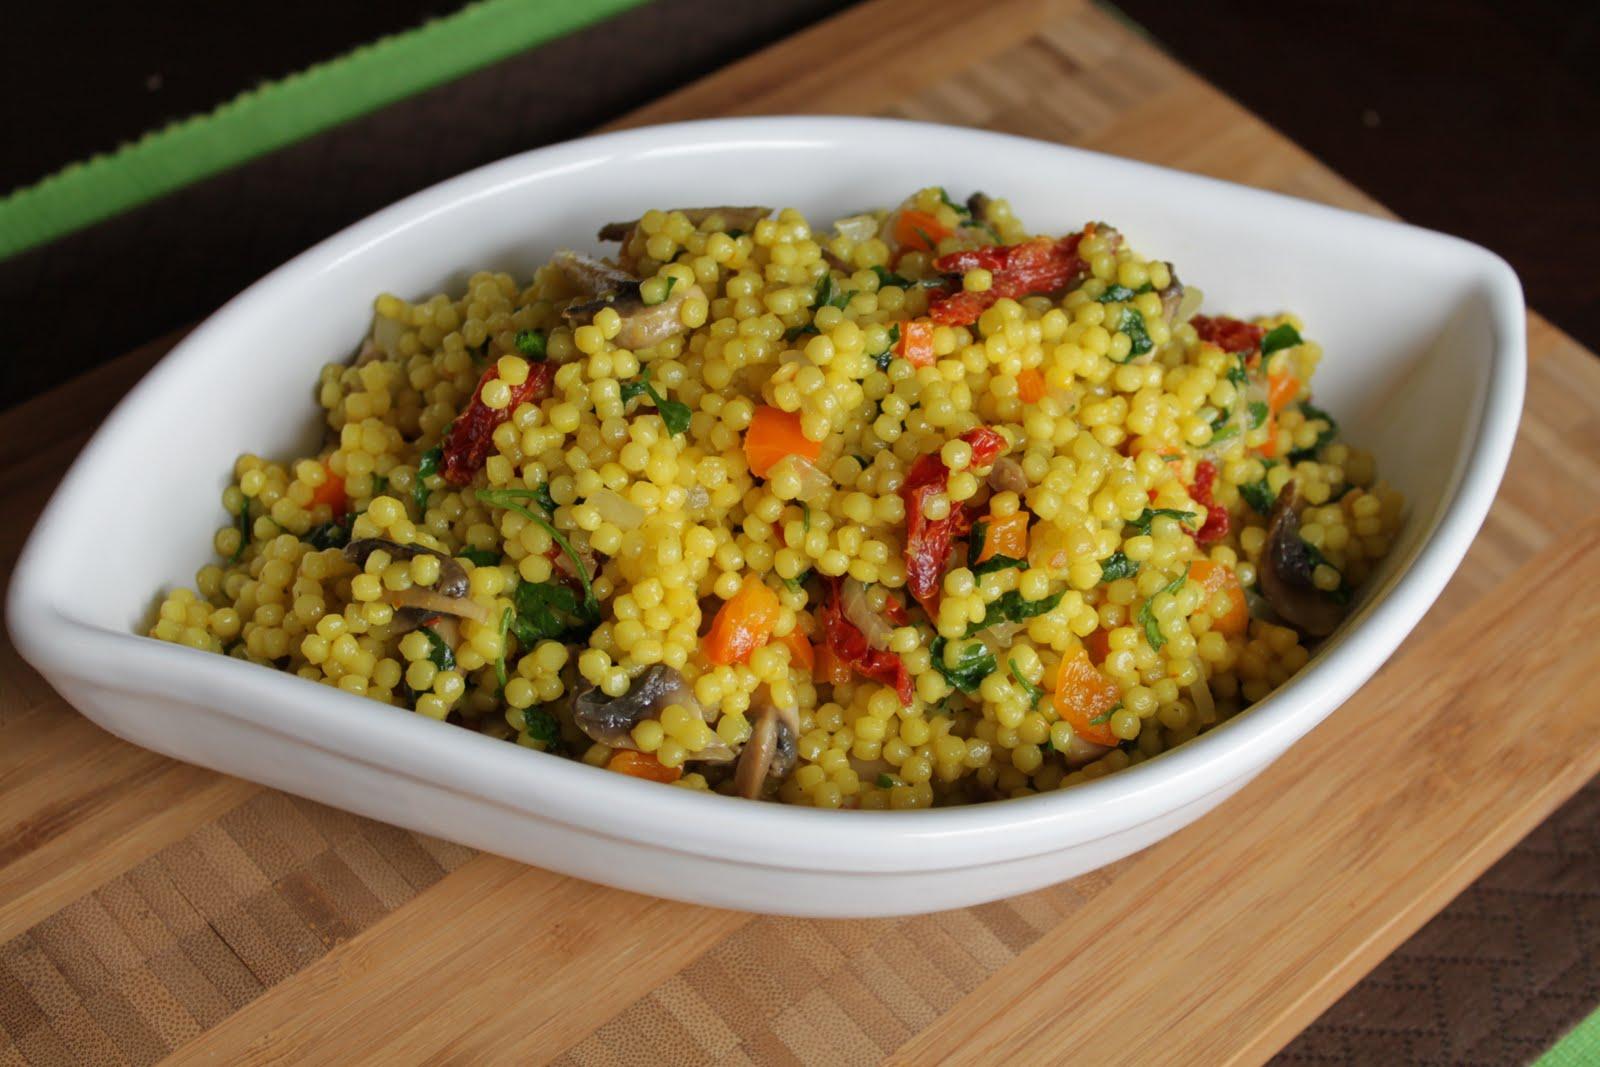 Malisa's Food Blog: Saffron Israeli Couscous Salad